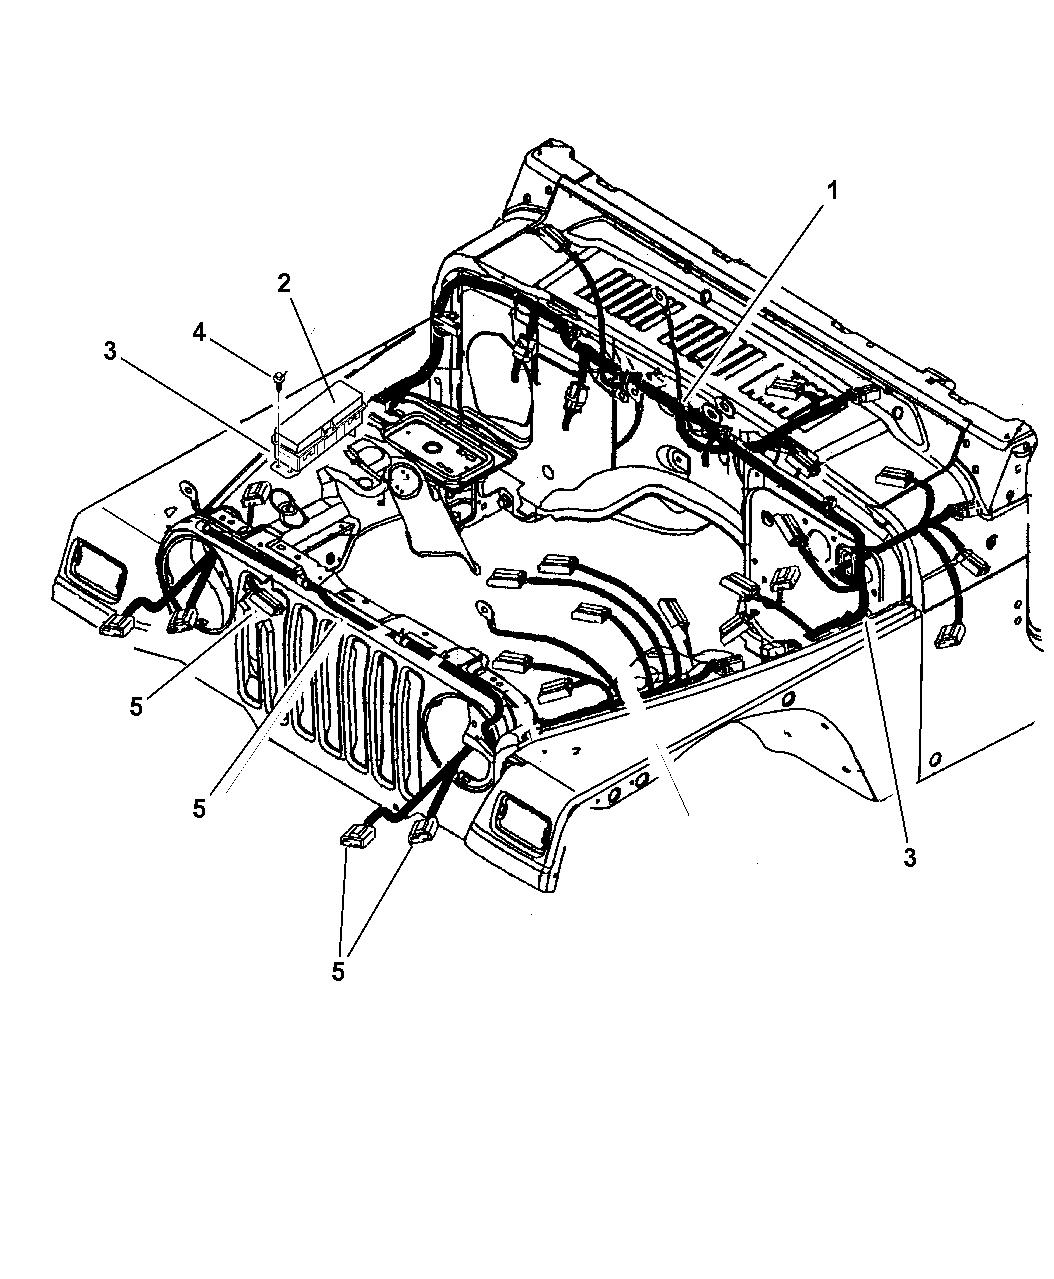 2002 jeep wrangler wiring